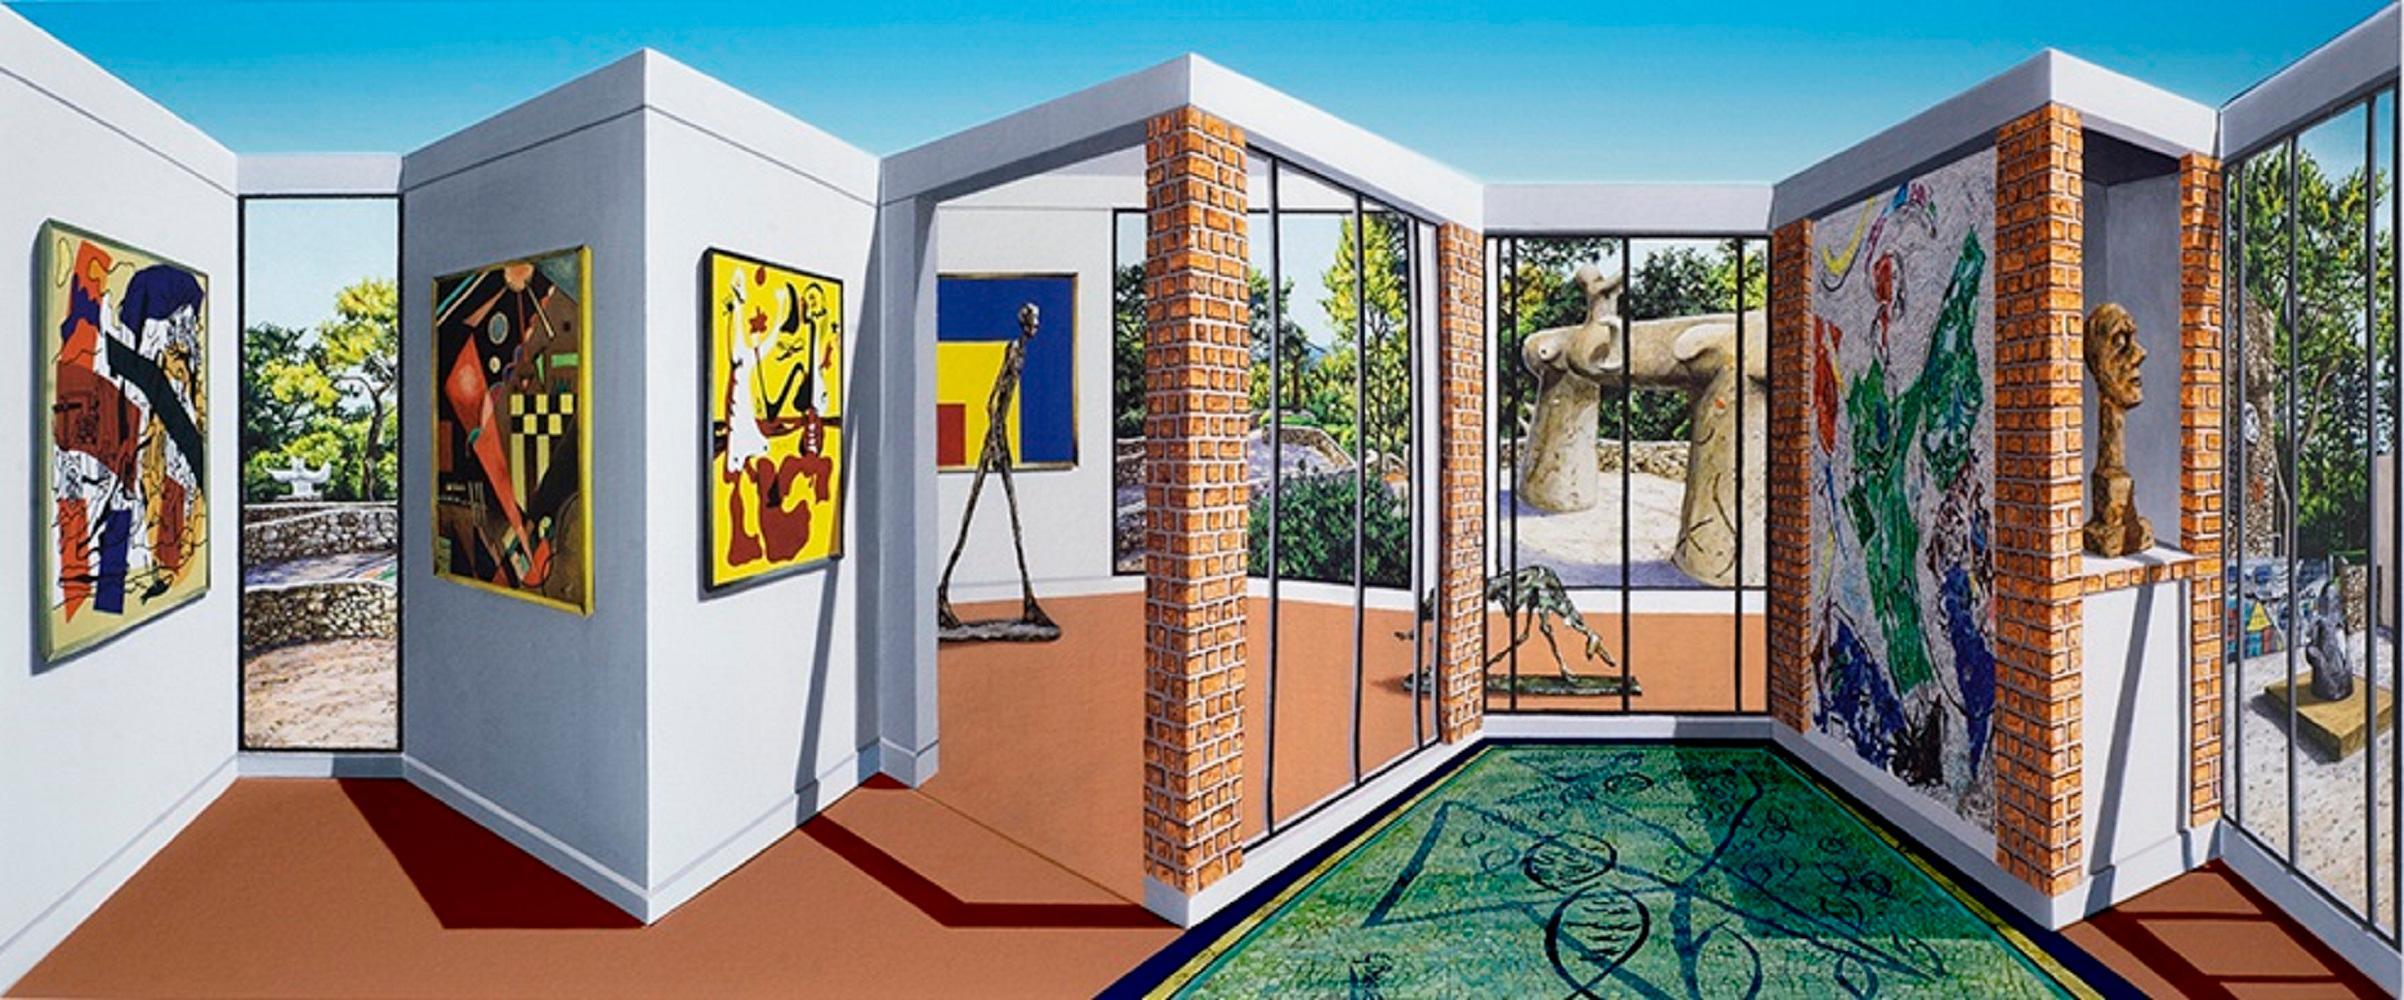 Patrick Hughes - Maeght, contemporary, op art, optical, reverspective, fondation